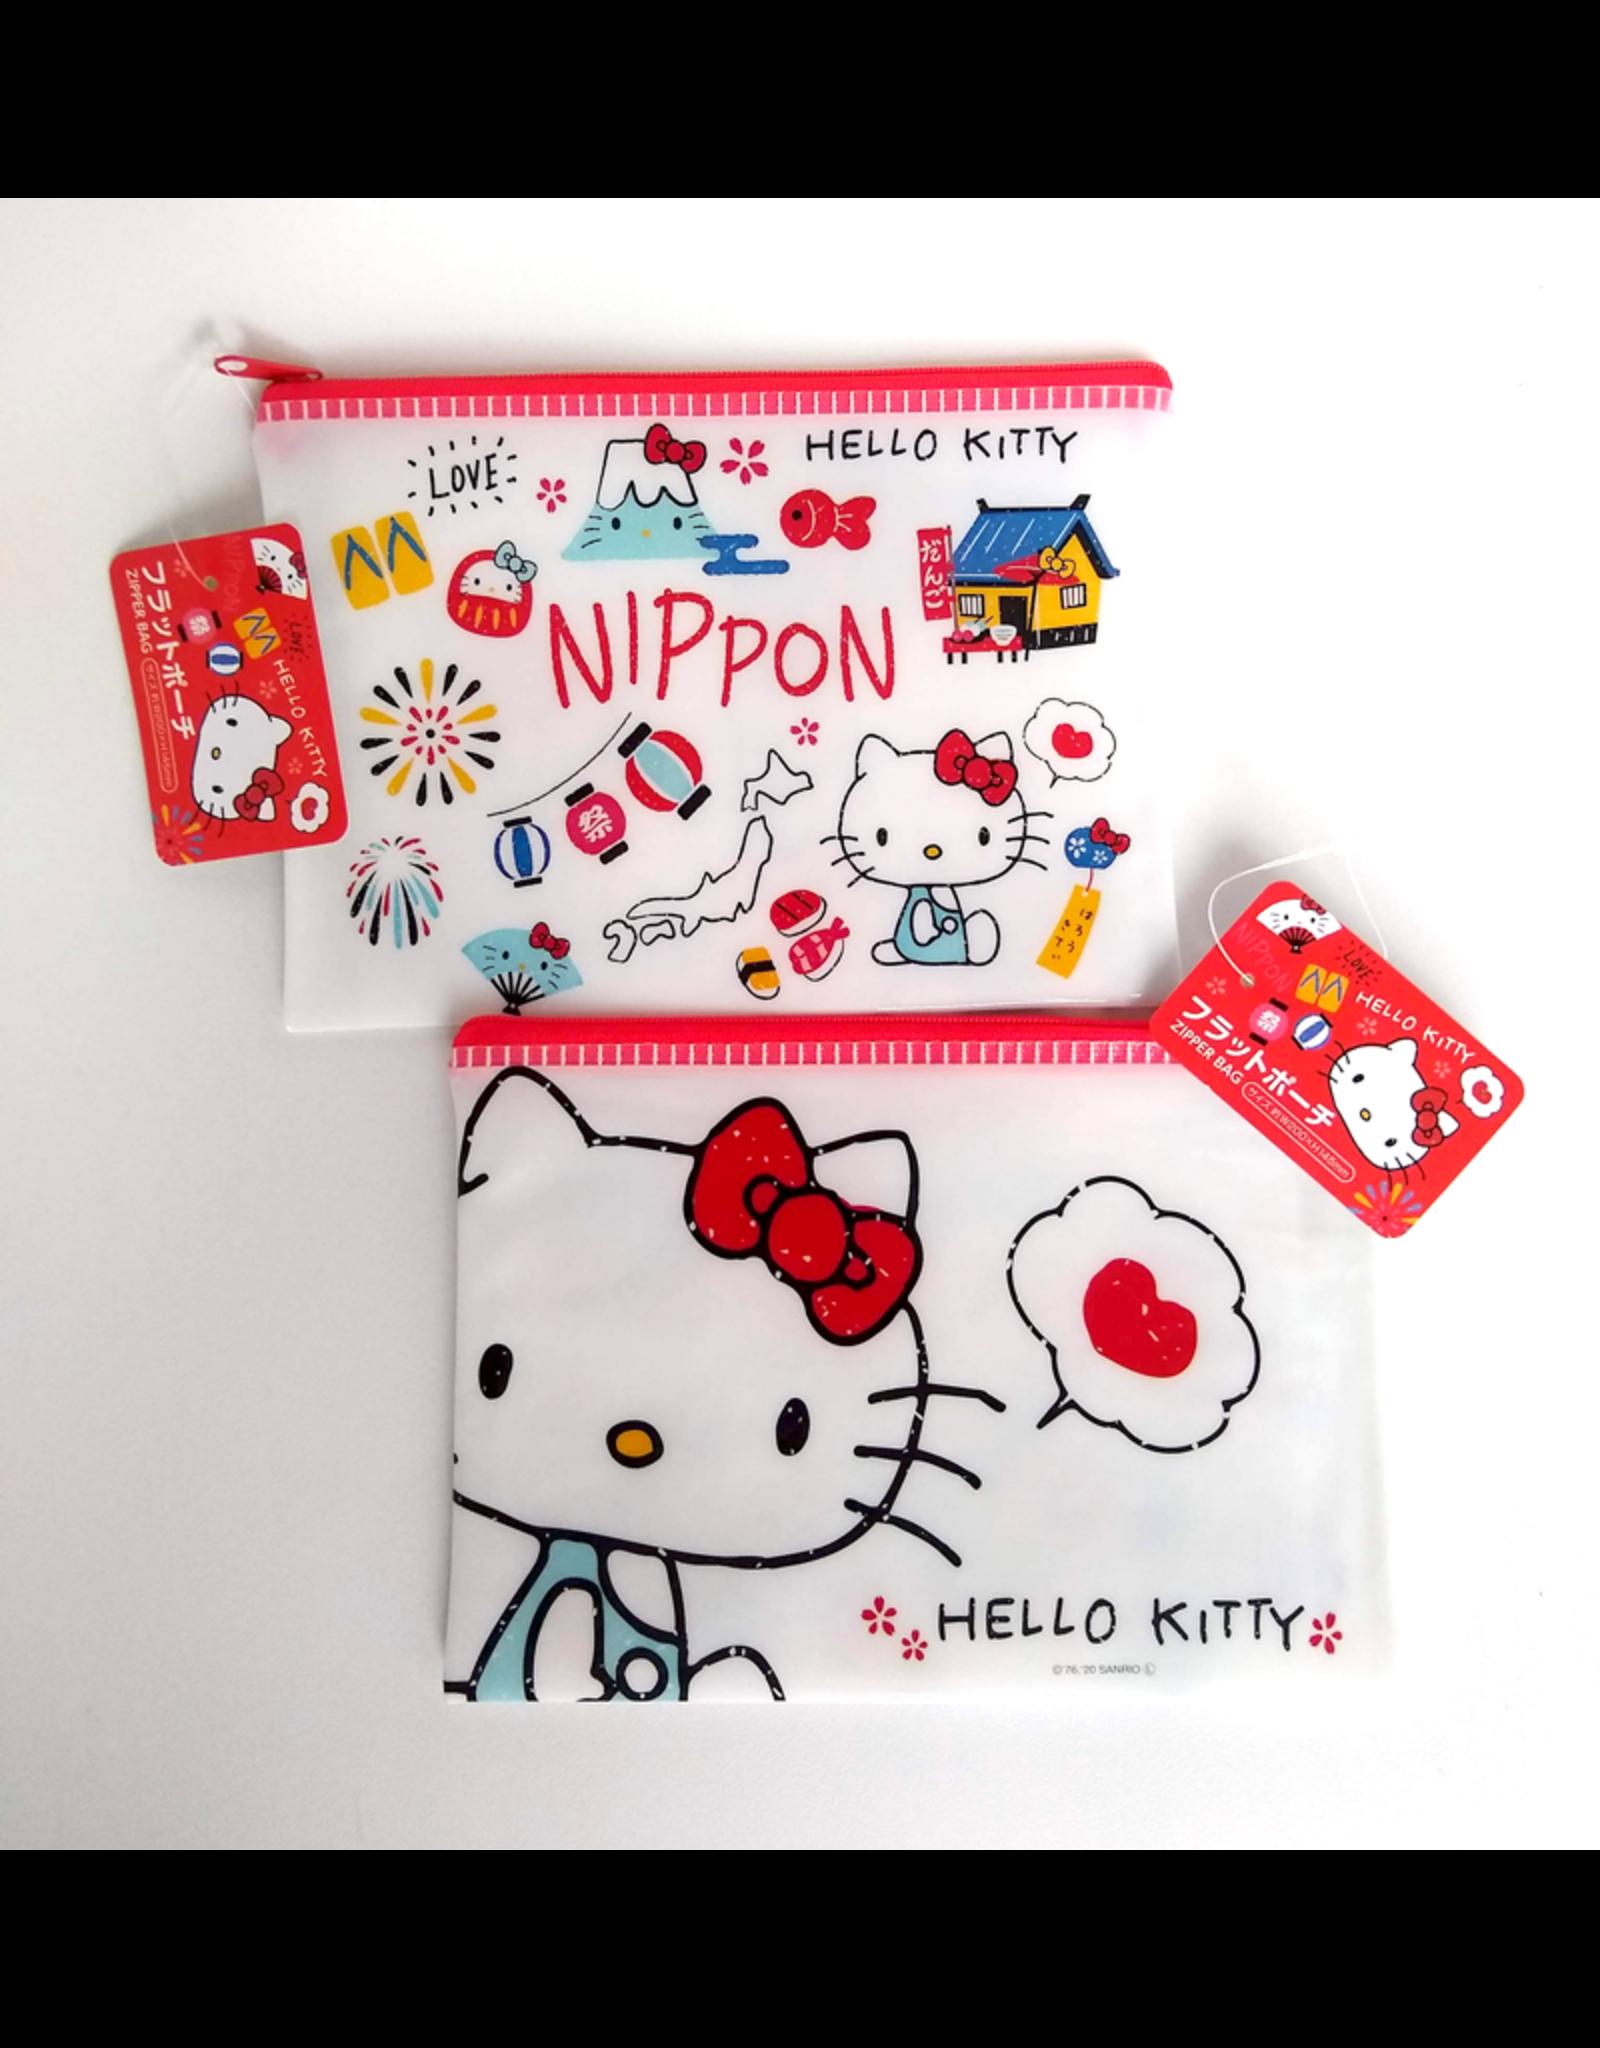 Hello Kitty Nippon - Zipper Bag - 19 x 14 cm